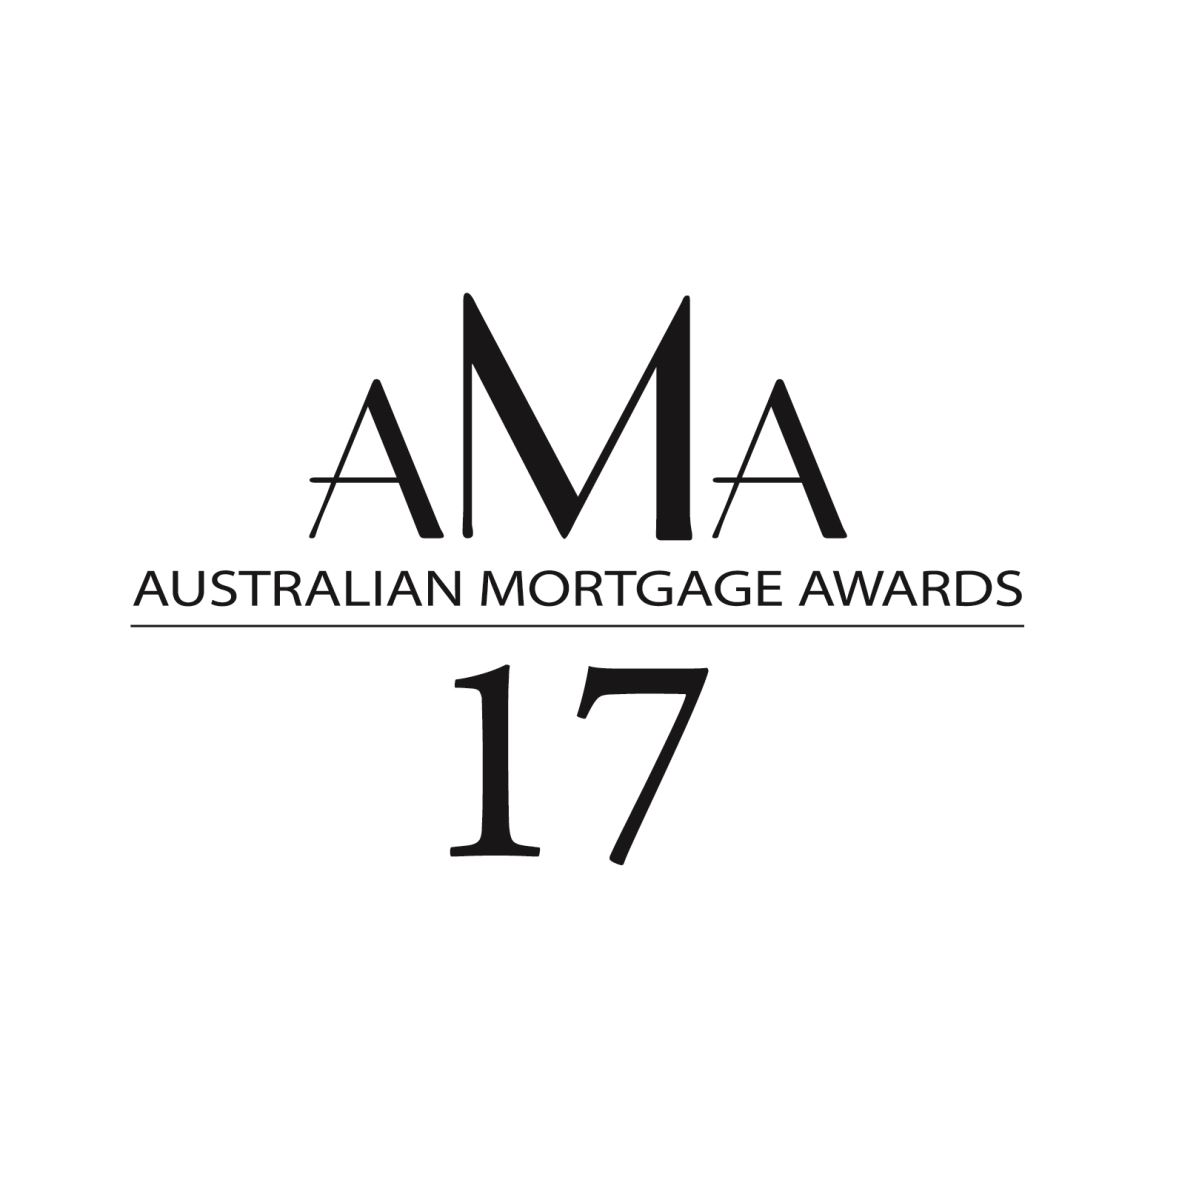 Australian Mortgage Awards category spotlight: Lenders